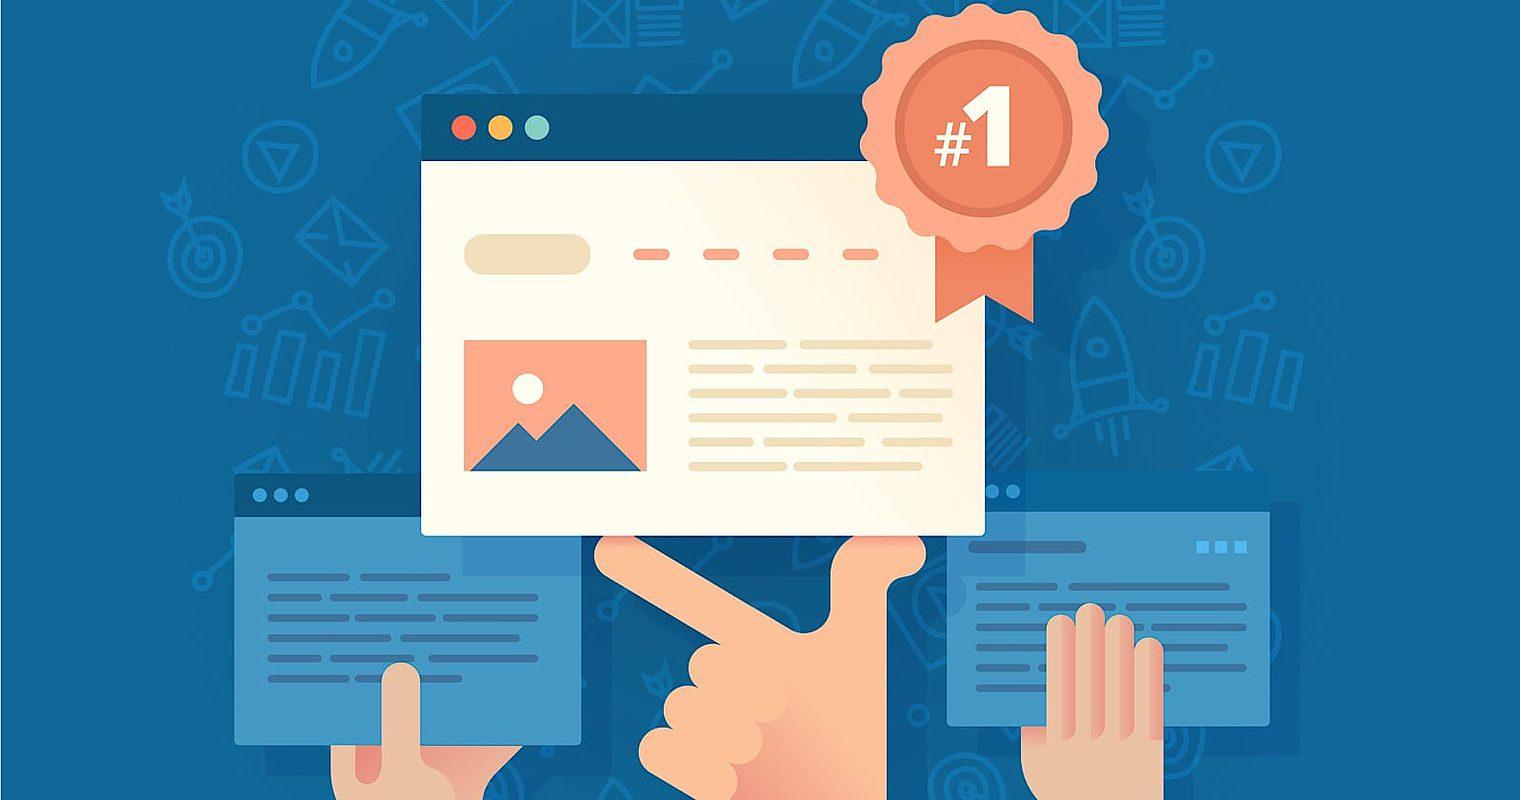 Top 17 Organic Search Ranking Factors [STUDY]